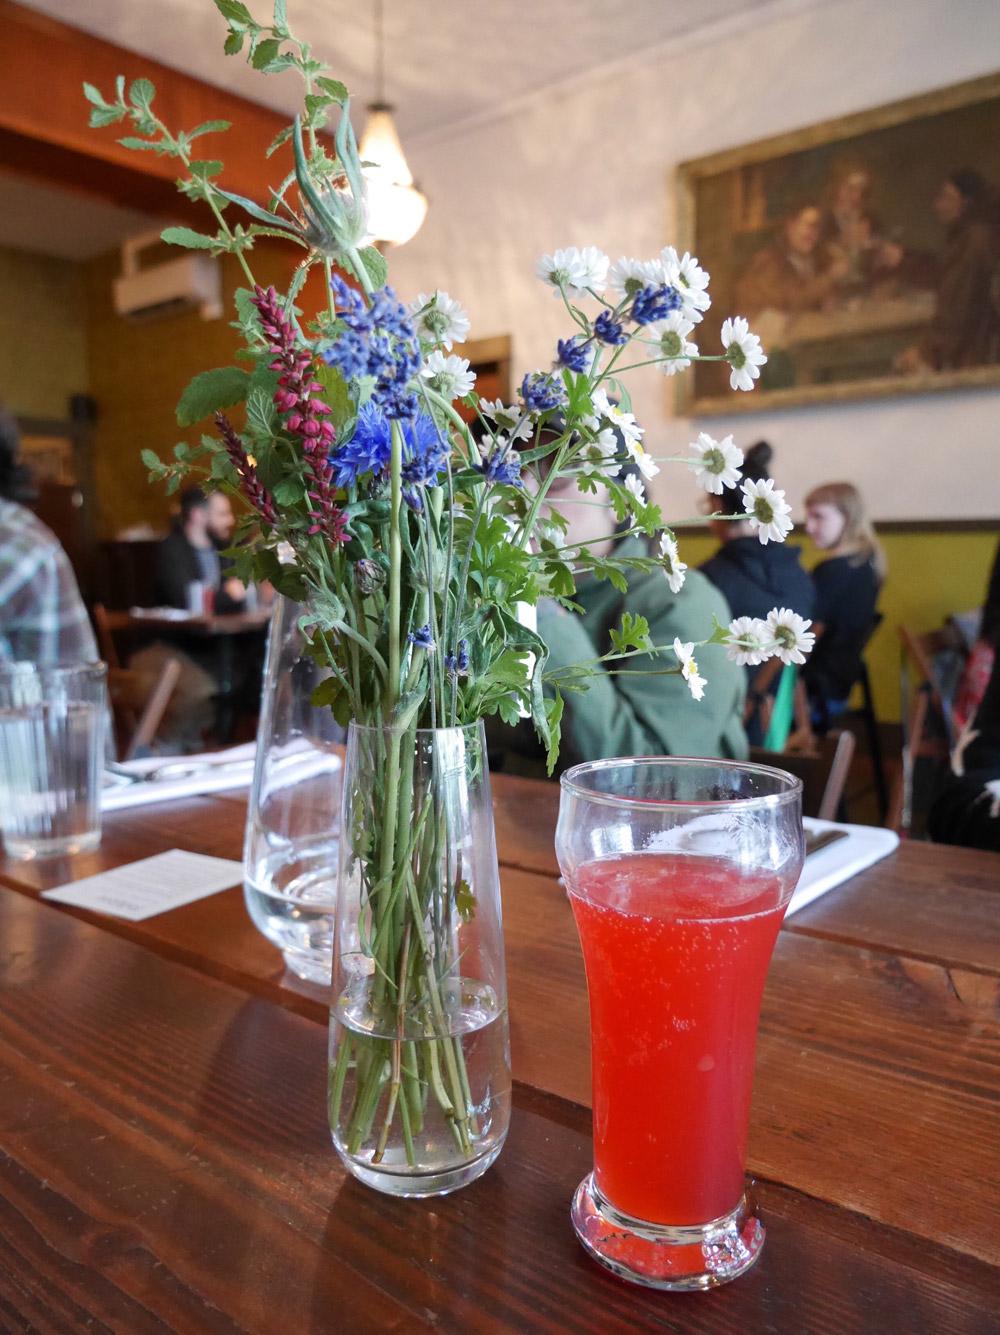 Raspberry Elderflower Kombucha, Folklore Plant-Based Agrarian Popup by Sean Sigmon, Portland